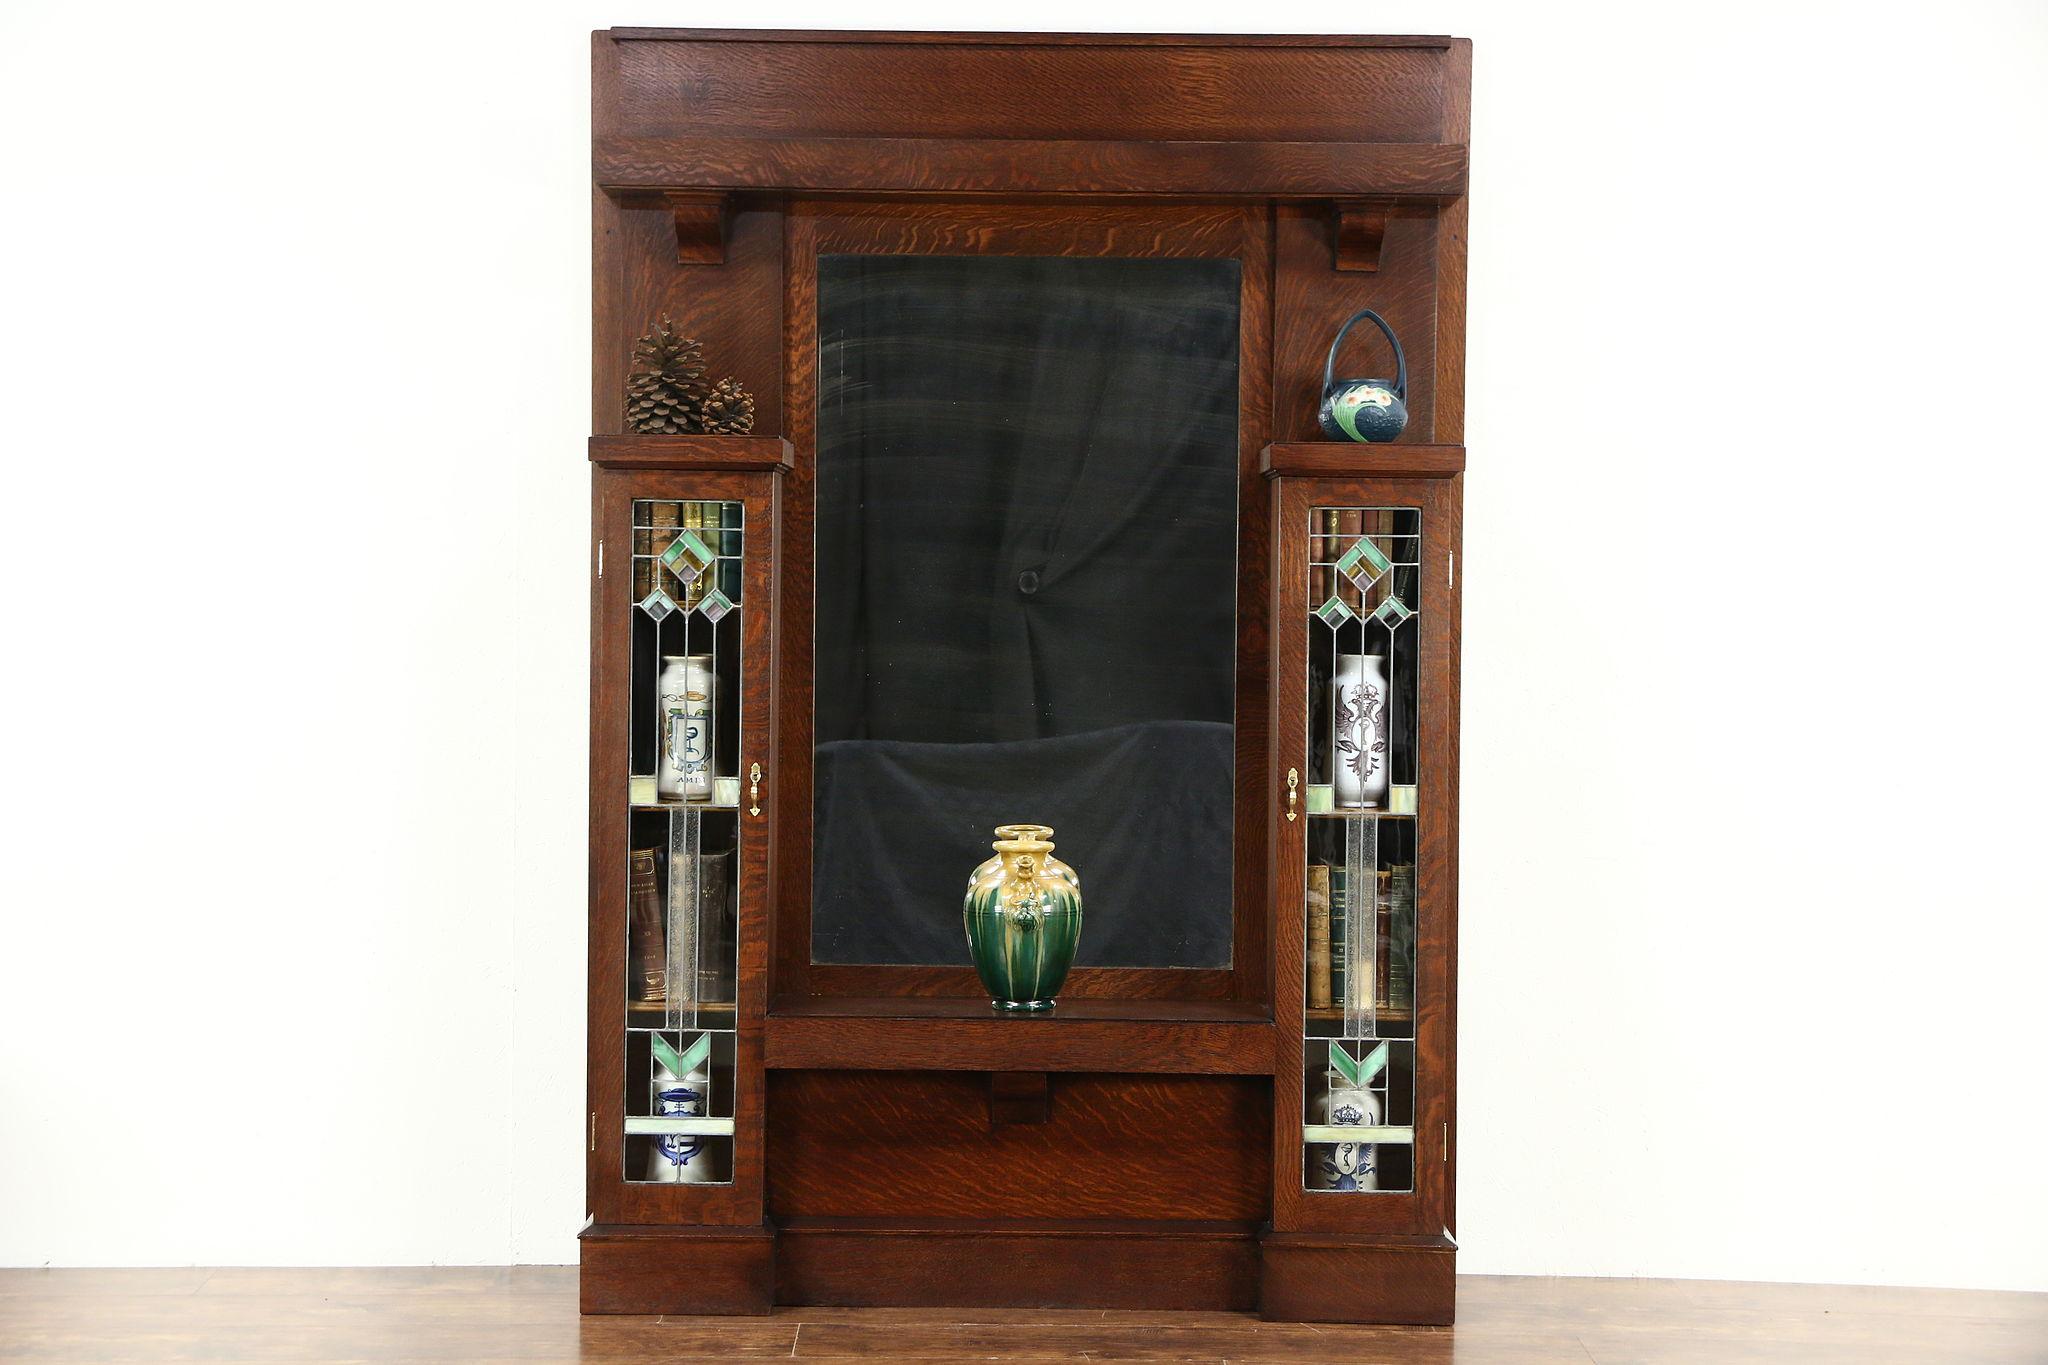 Arts U0026 Crafts Mission Oak Antique Hall Mirror, Leaded Glass, Petersen  Chicago ...